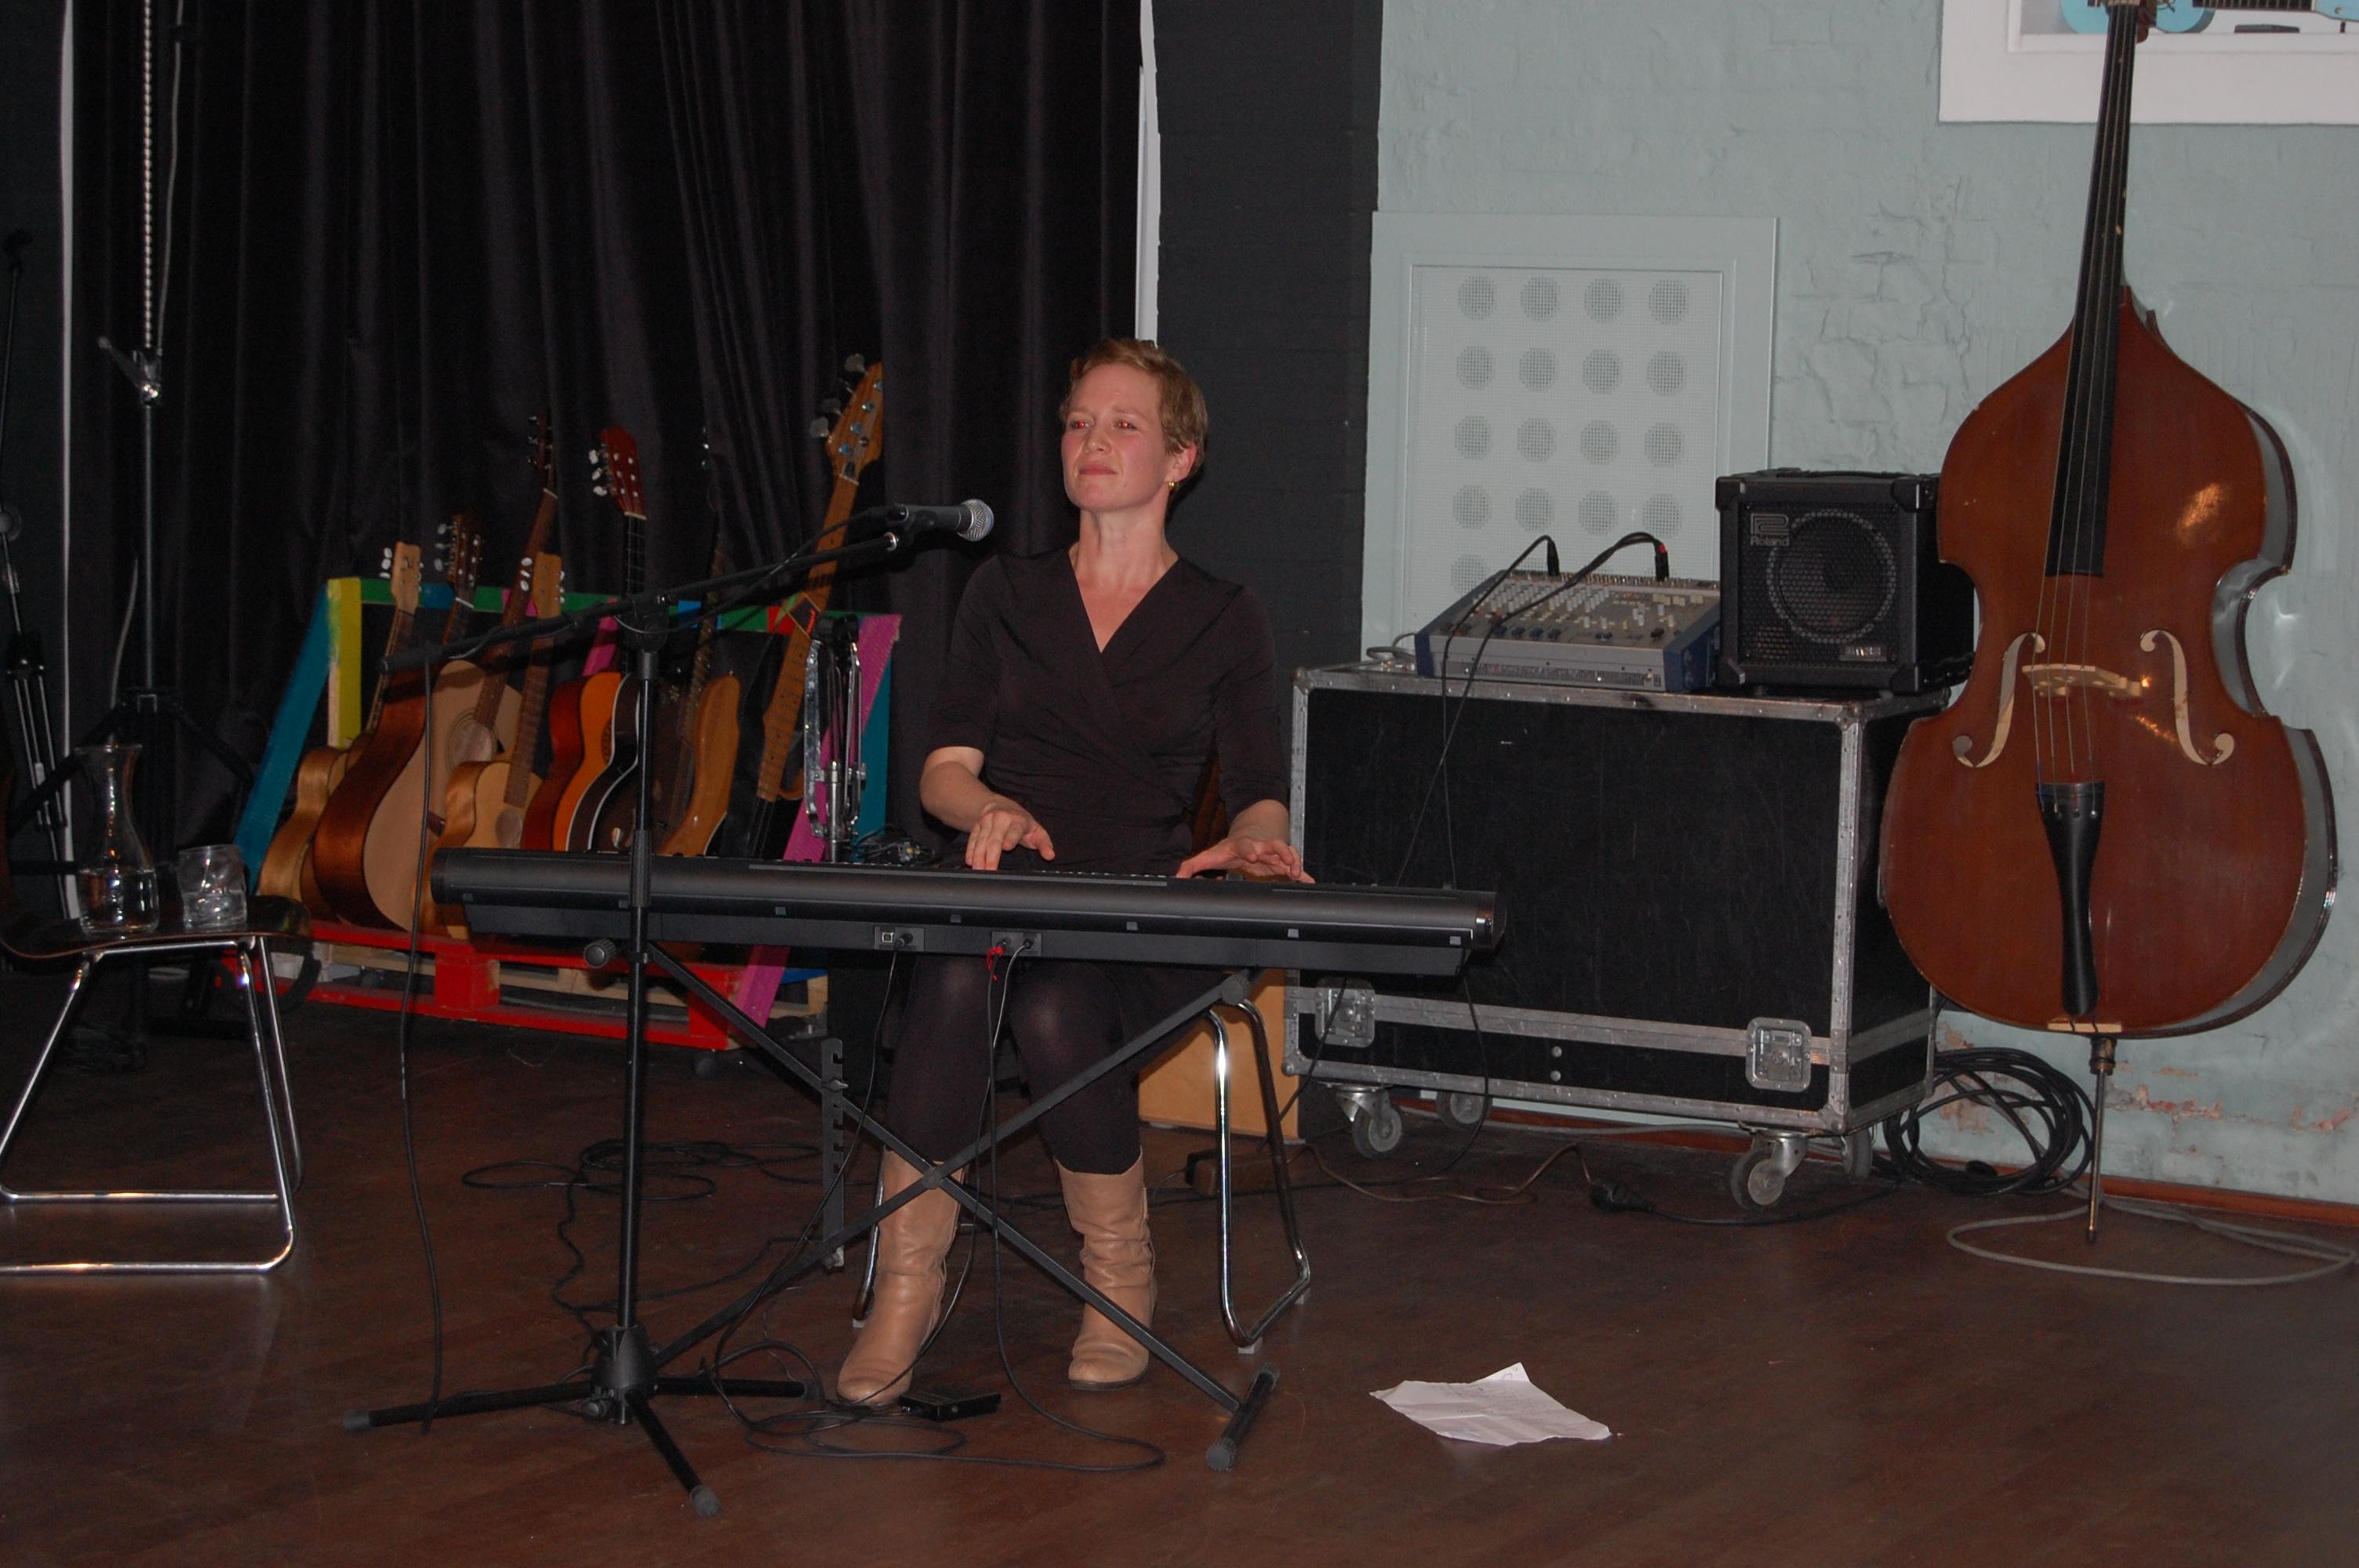 2019-09-21 Konzert Amalia Chikh mosaique LG (7)